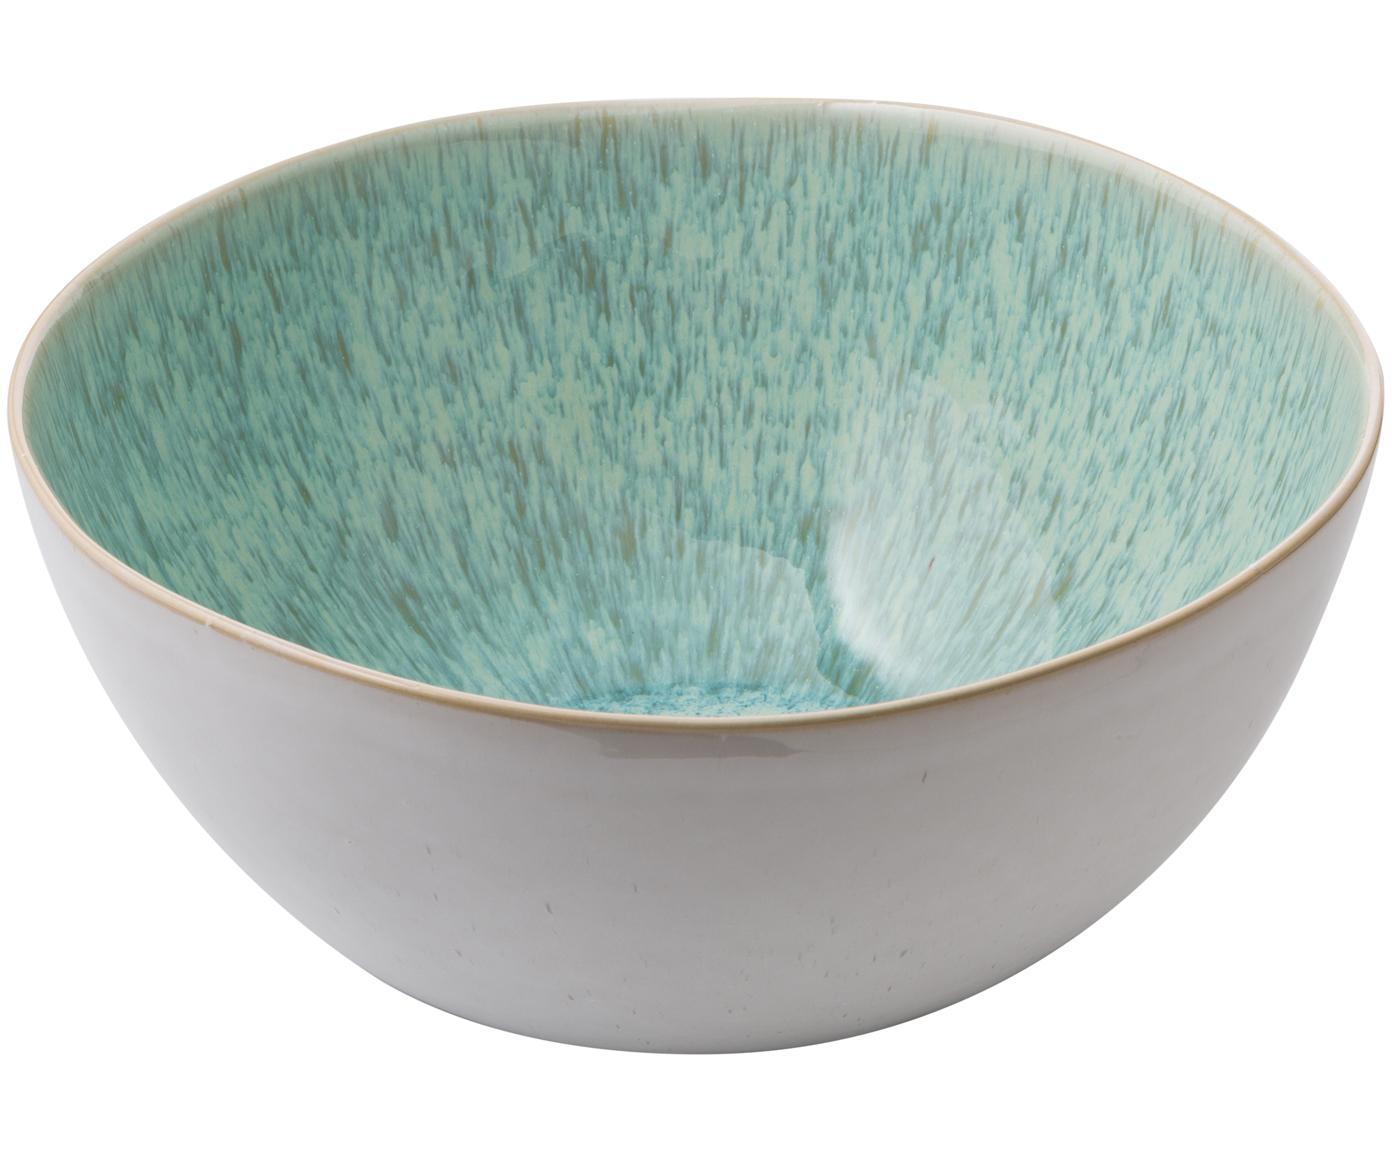 Handbemalte Salatschüssel Areia, Steingut, Mint, Gebrochenes Weiss, Beige, Ø 26 x H 12 cm